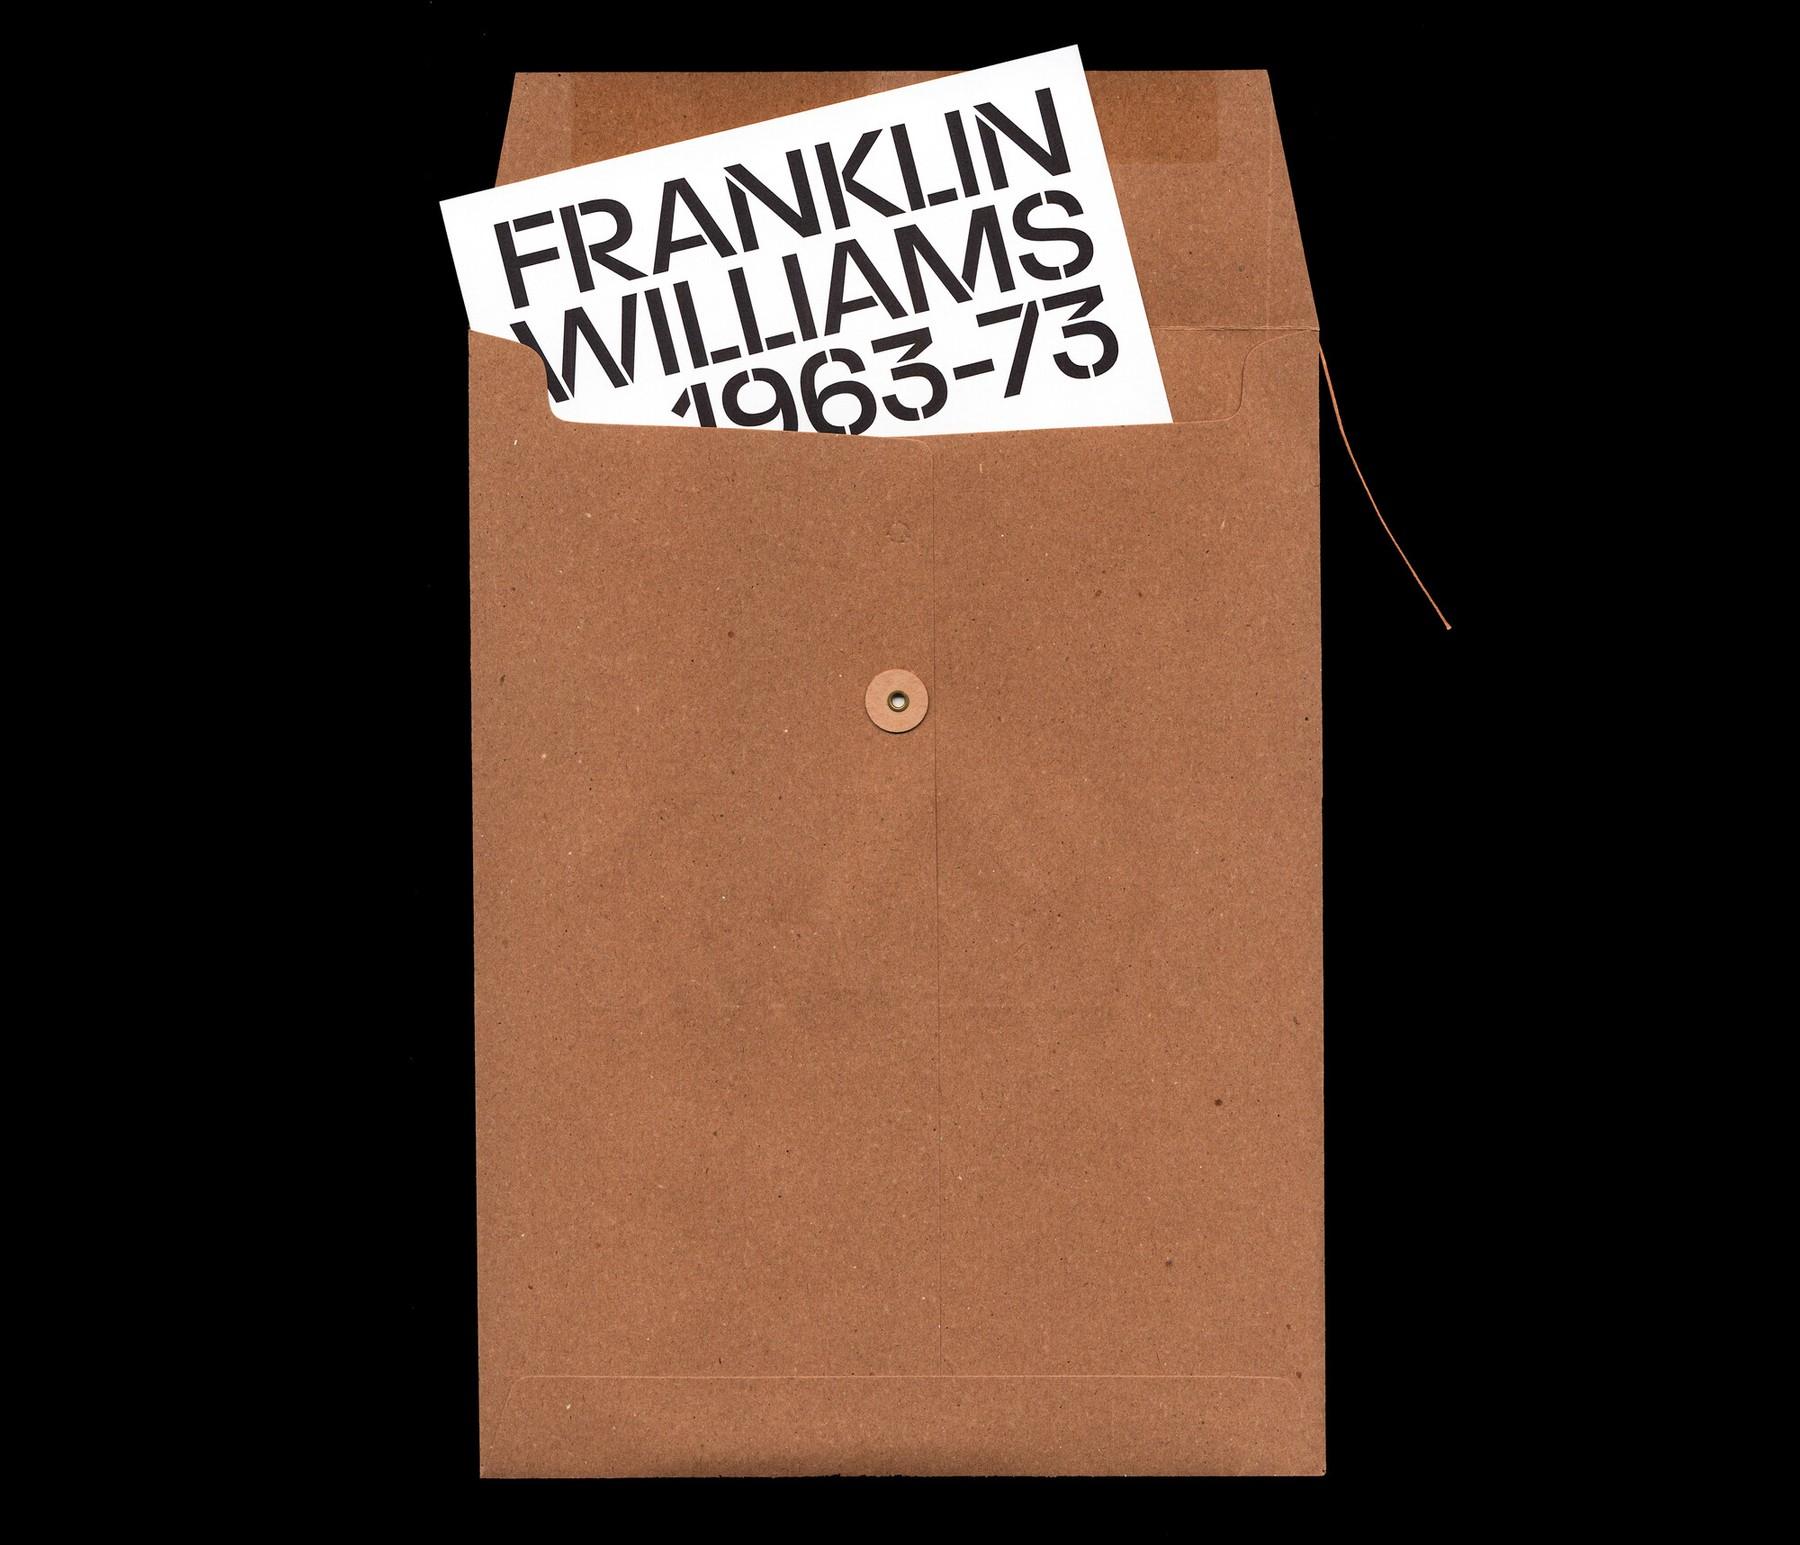 Franklin Williams: 1963–73 at Parker Gallery by Folder Studio